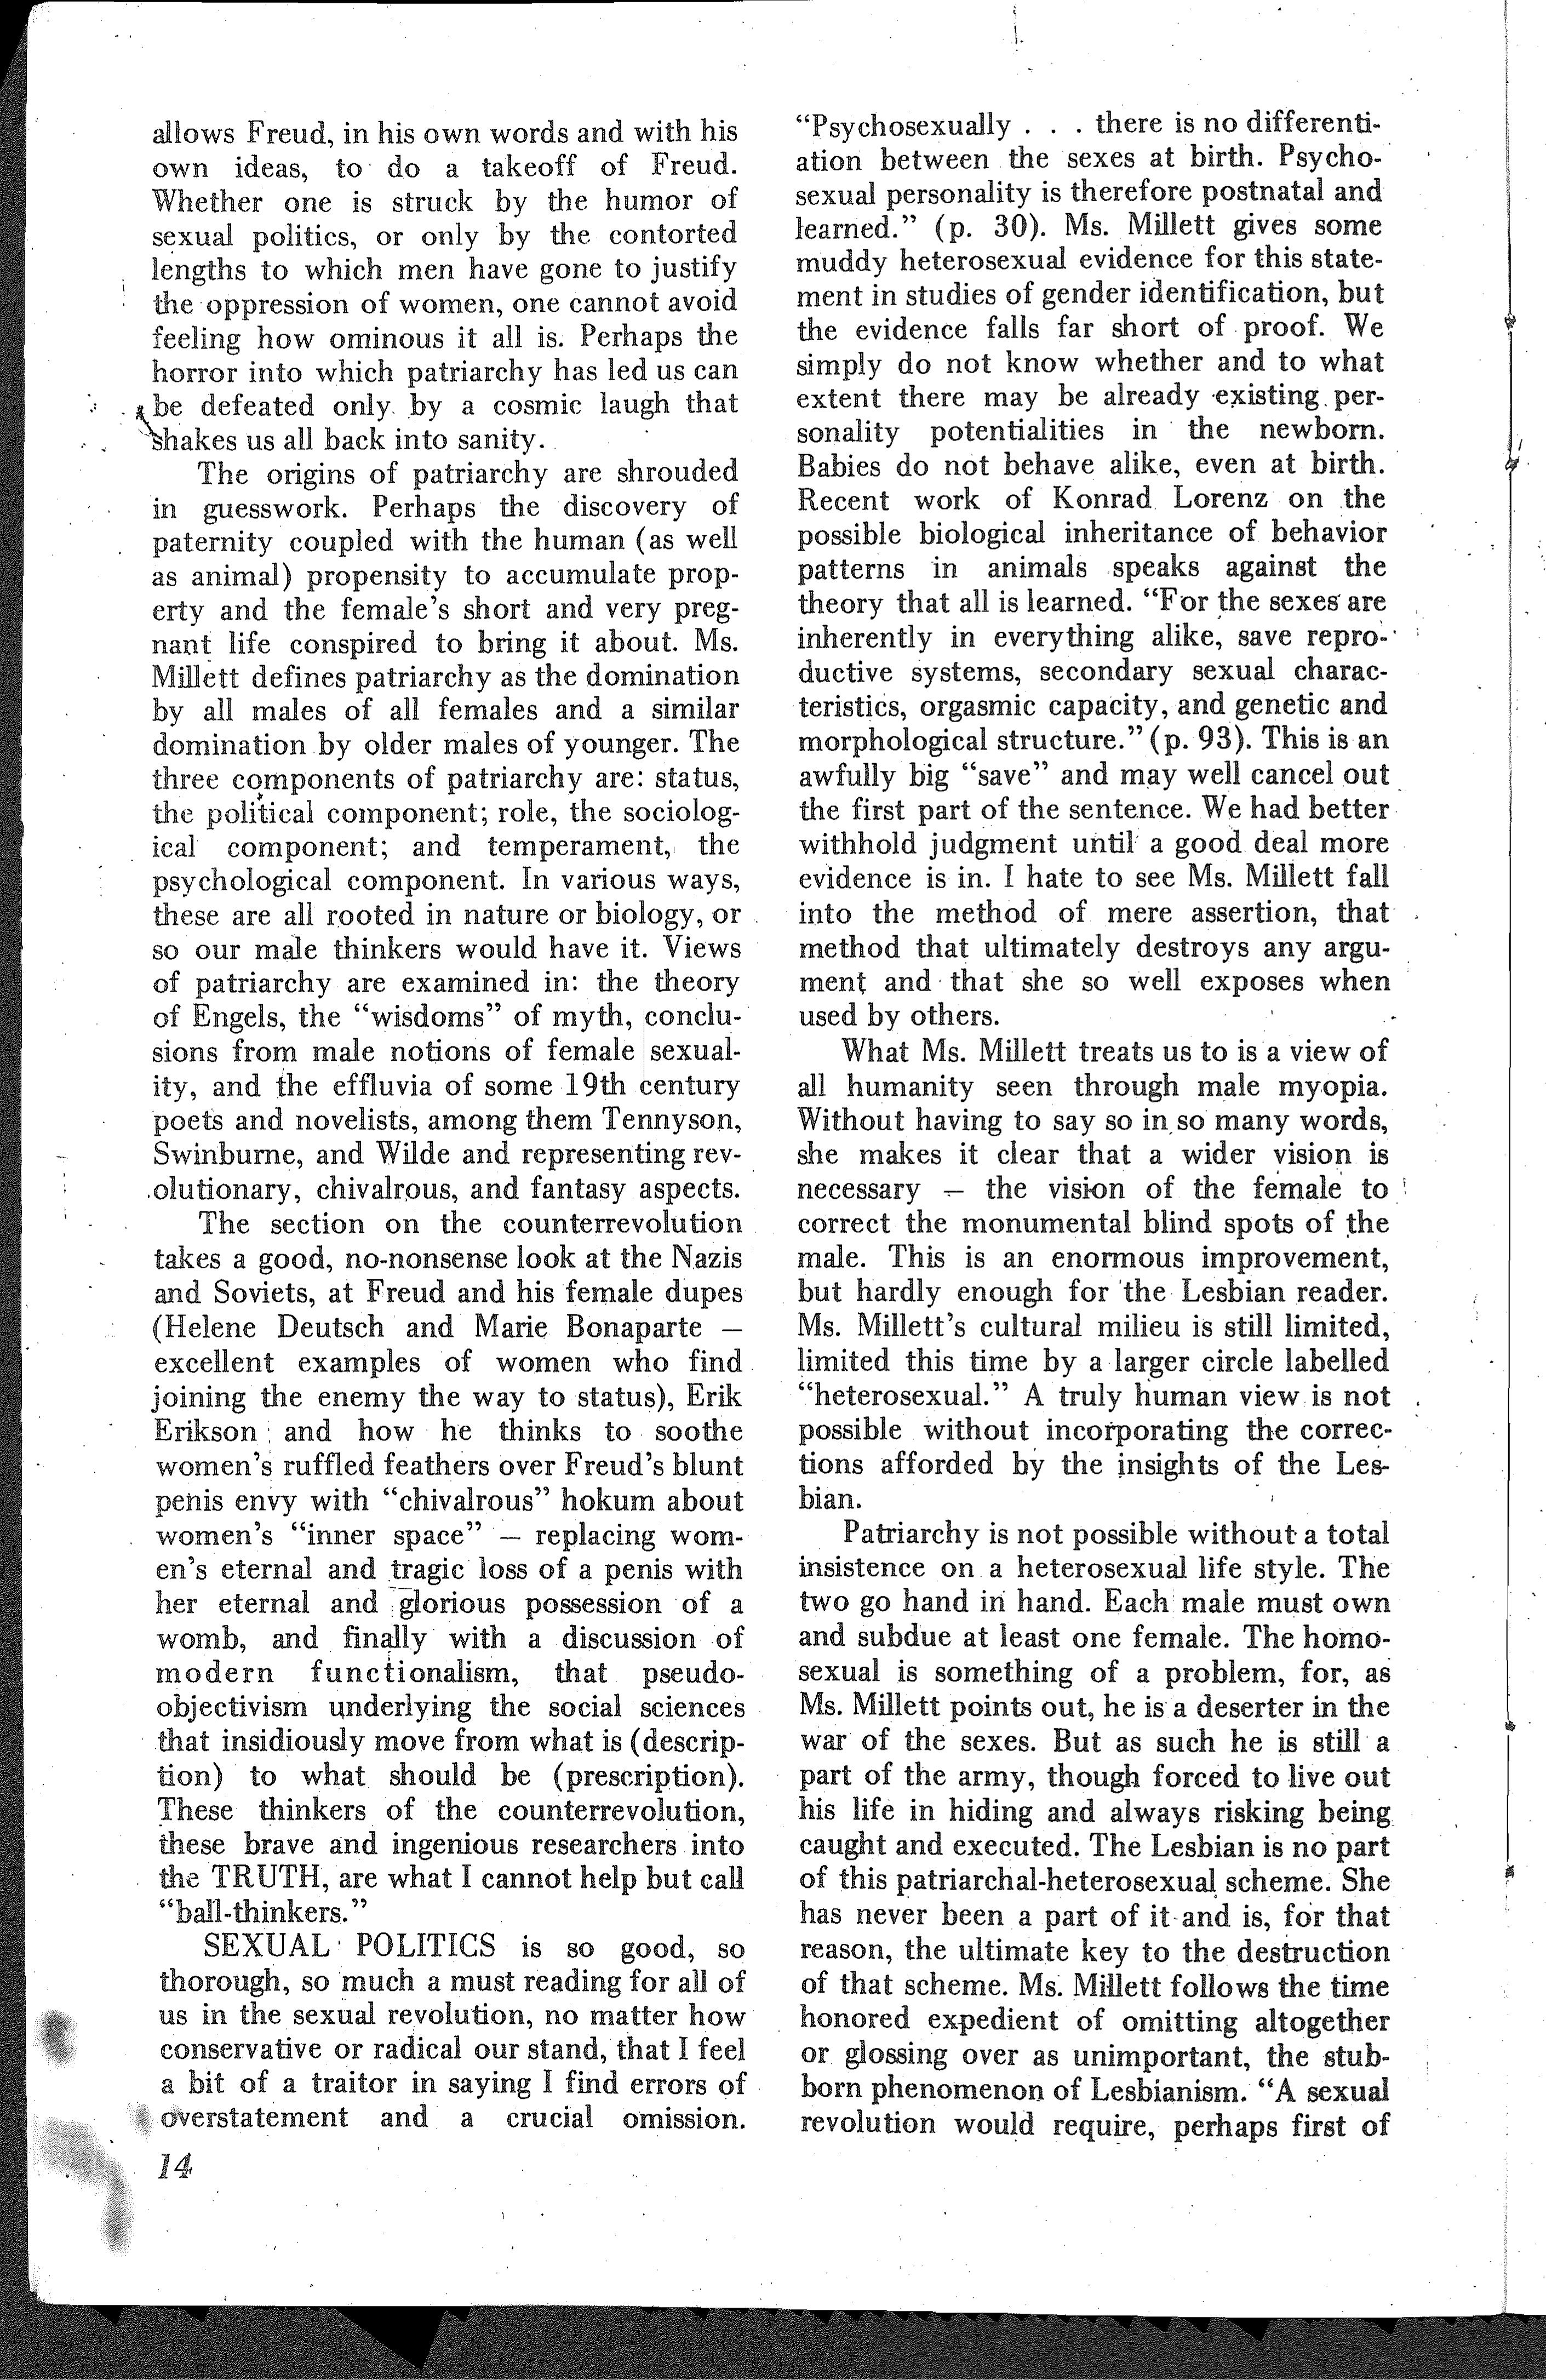 The Ladder, October-November 1970, Vol  15, No  1 and 2